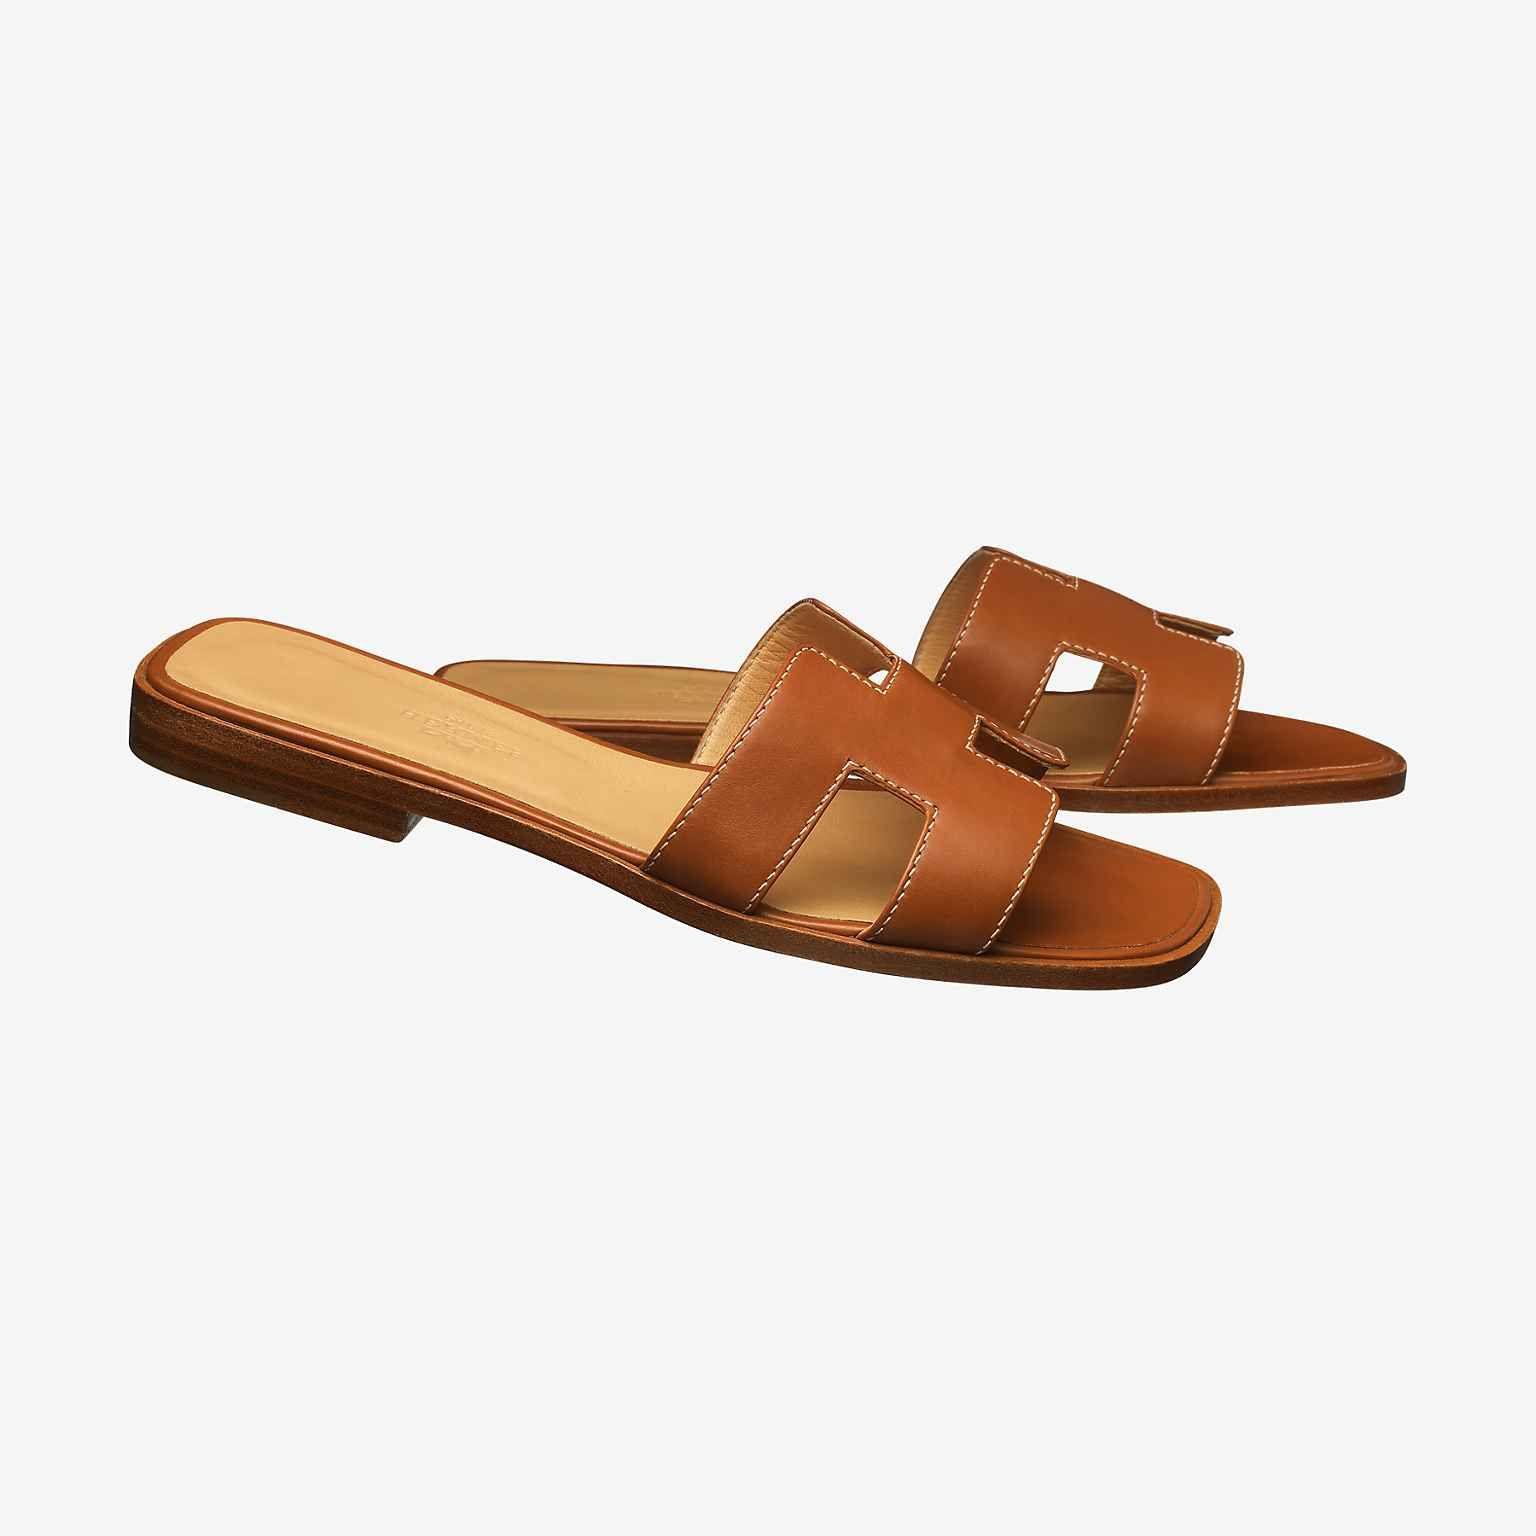 7679a2210faf Oran sandal